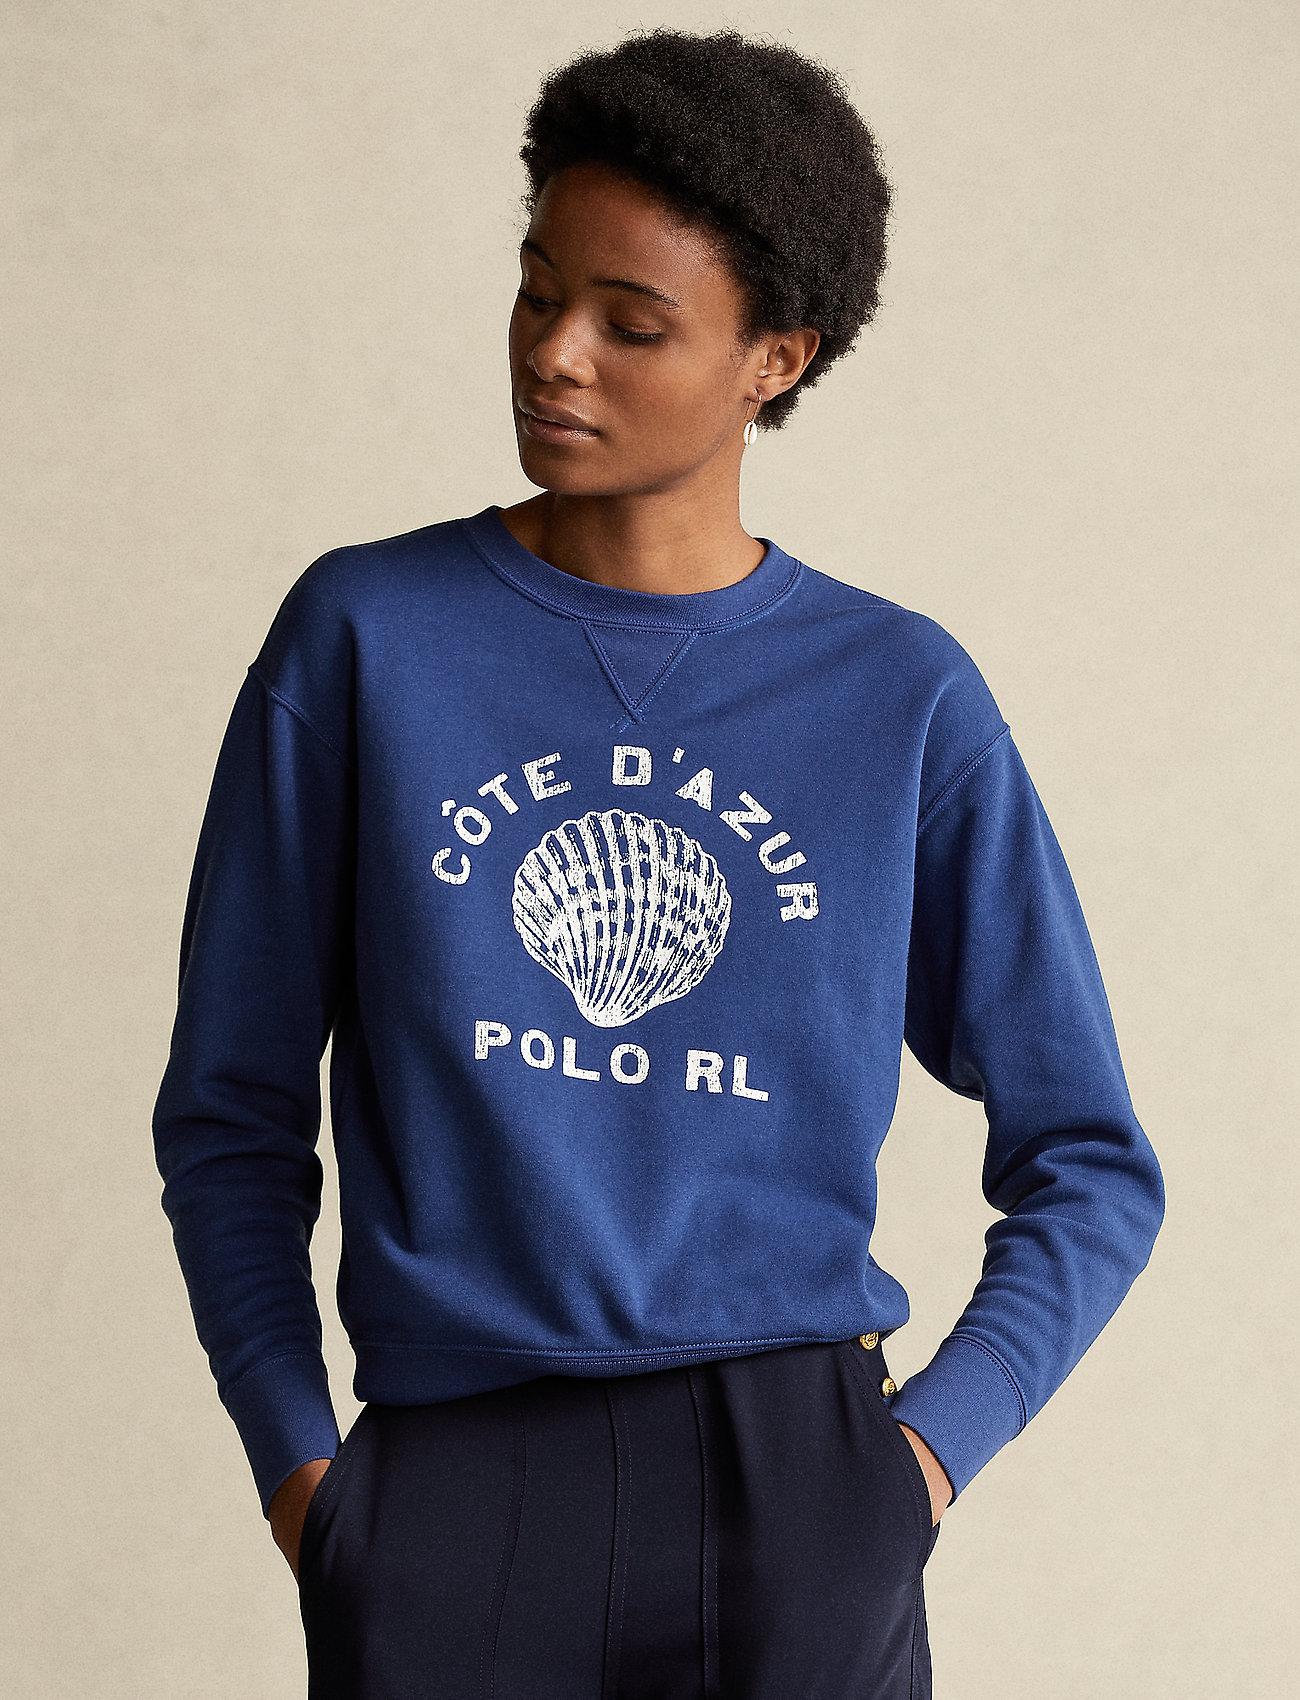 Polo Ralph Lauren - Côte d'Azur Fleece Sweatshirt - sweatshirts - vineyard royal - 0